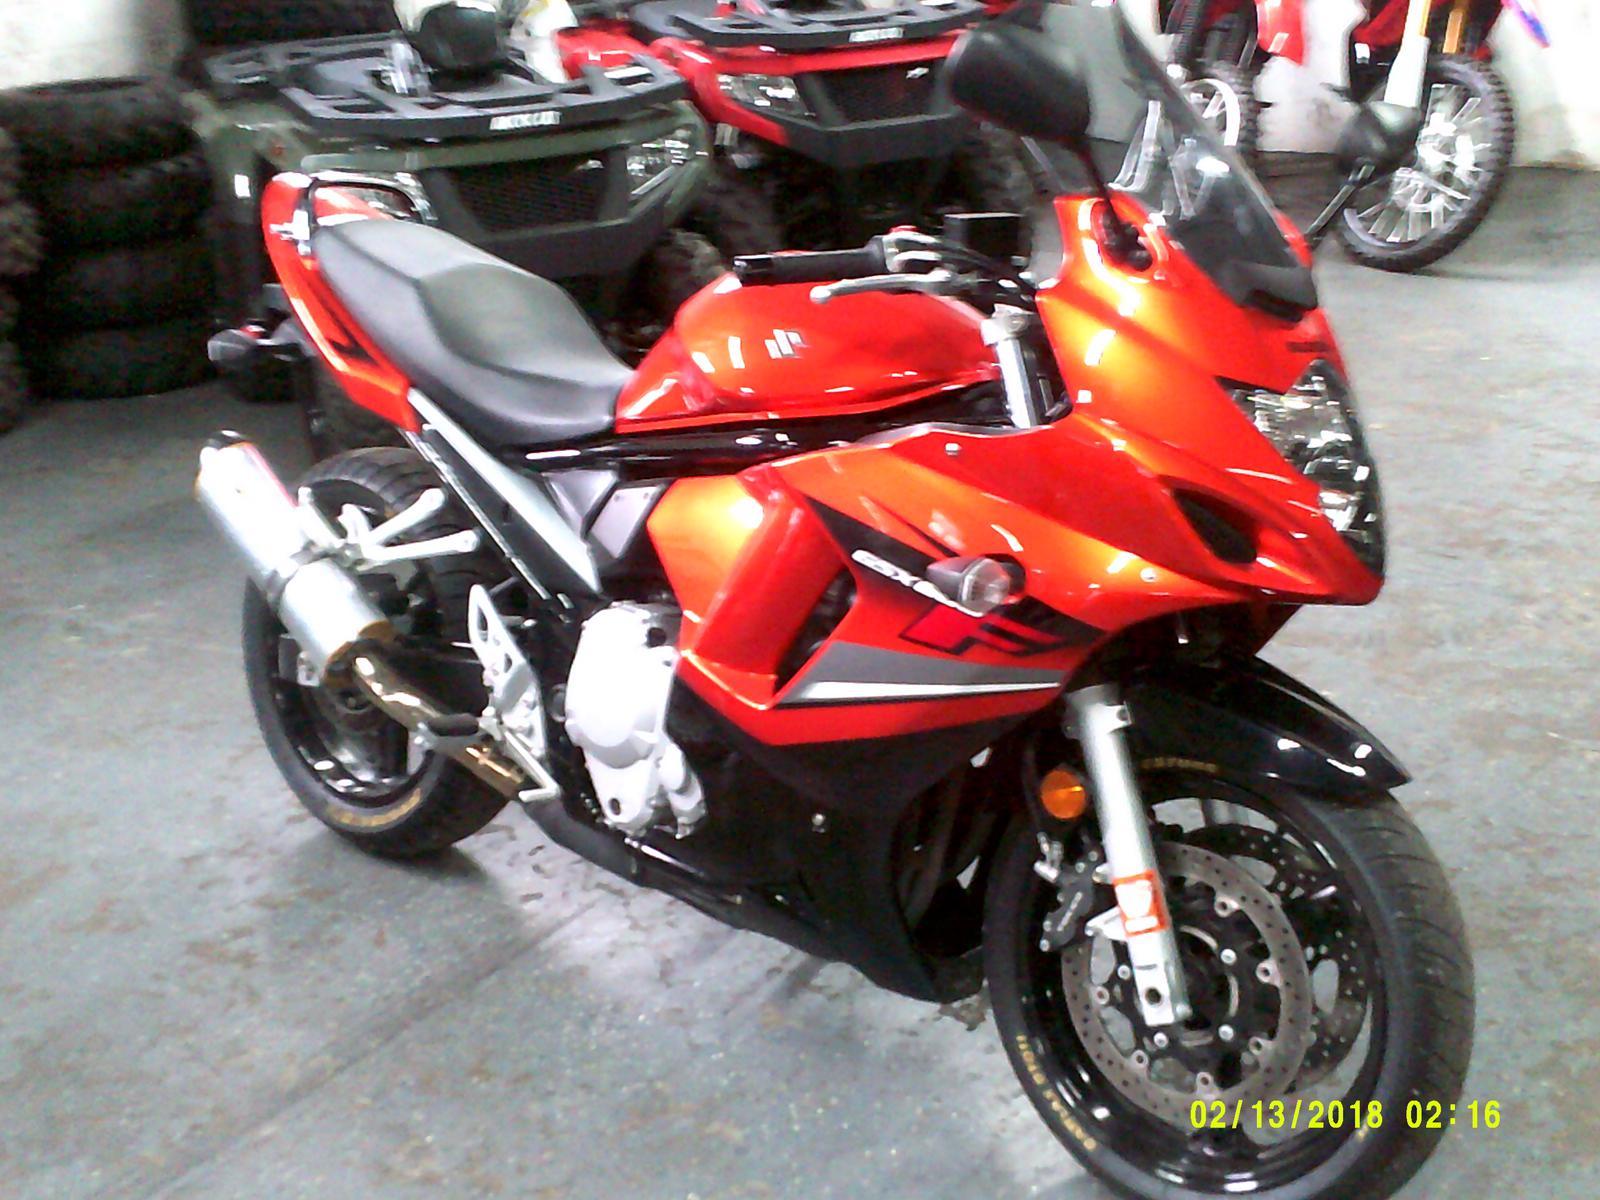 2008 Kawasaki Vulcan 1600a8f For Sale In Charleston Wv Dohm Fuel Filter 1600